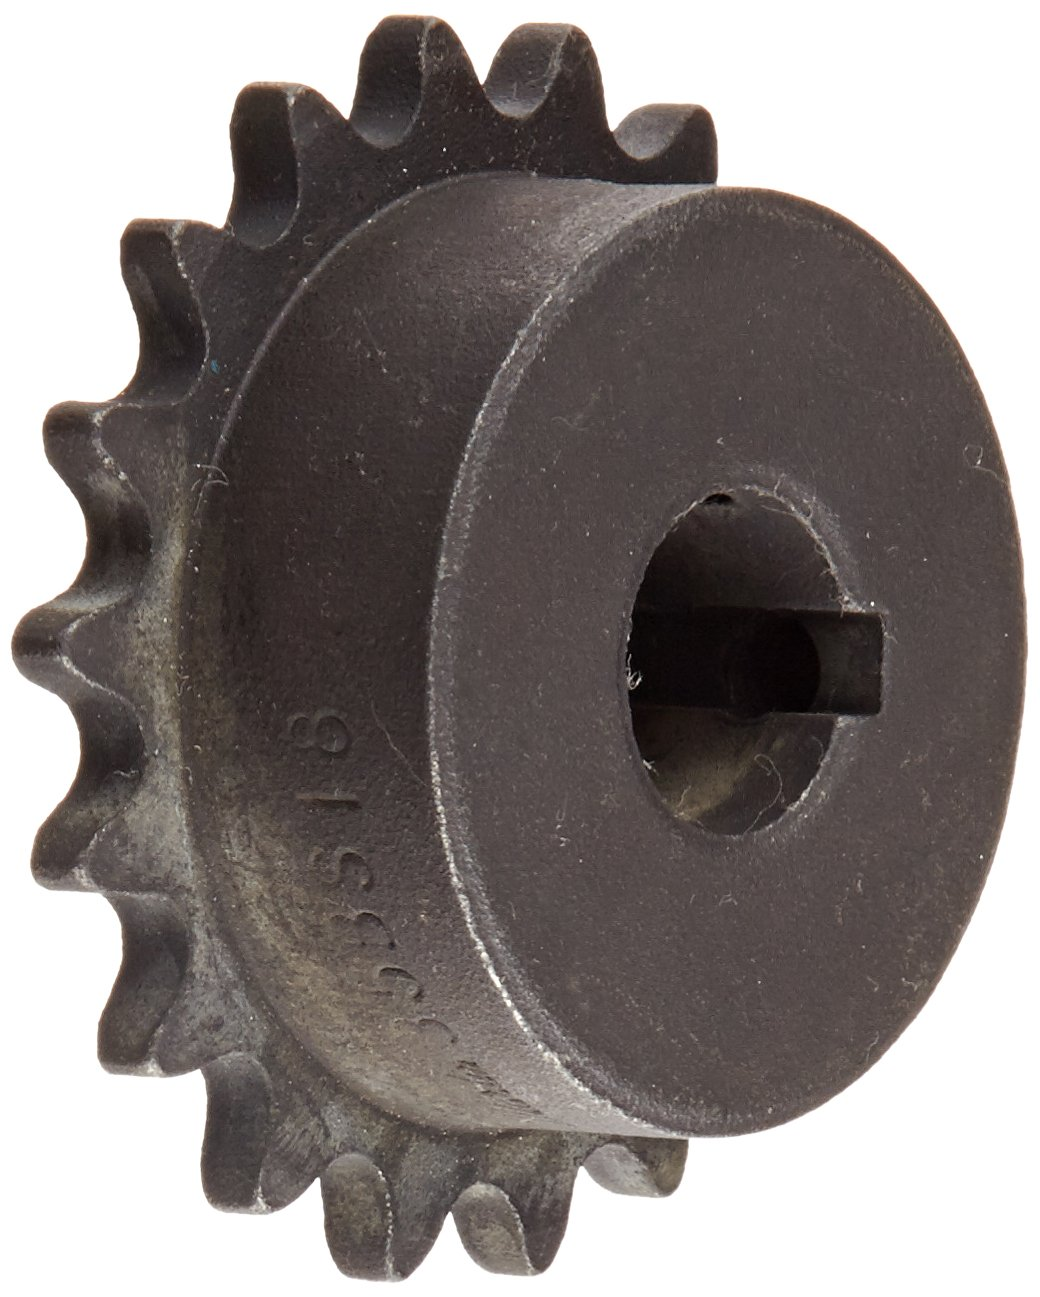 35 Chain Size Bored-to-Size Single Strand 1.7188 Hub Dia. 0.168 Width 18 Teeth 0.625 Bore Dia. Type B Hub 2.352 OD 0.375 Pitch Martin Roller Chain Sprocket